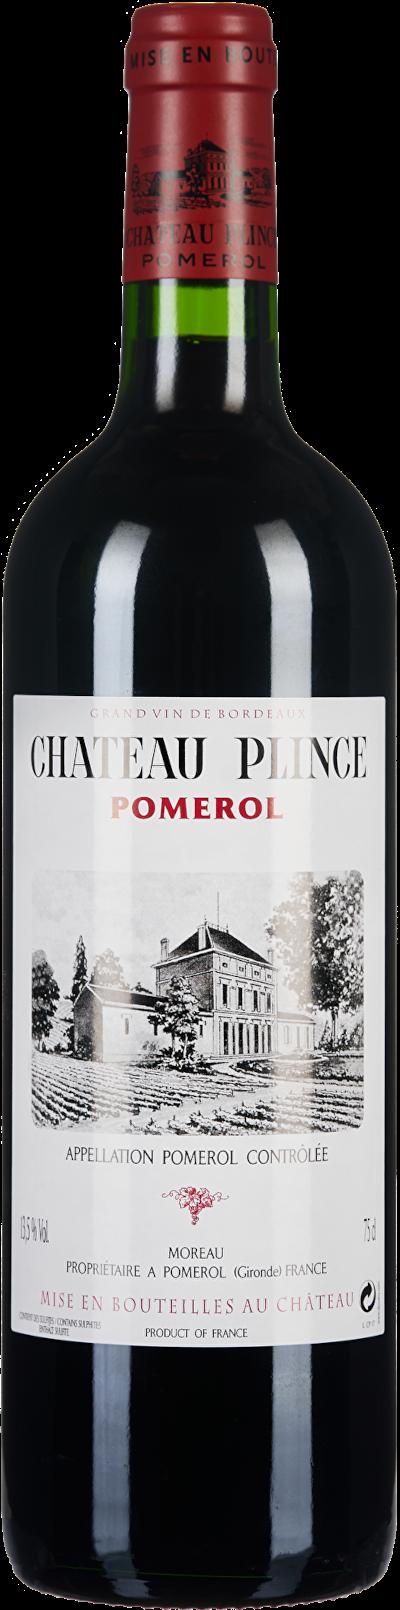 Château Plince - Pomerol